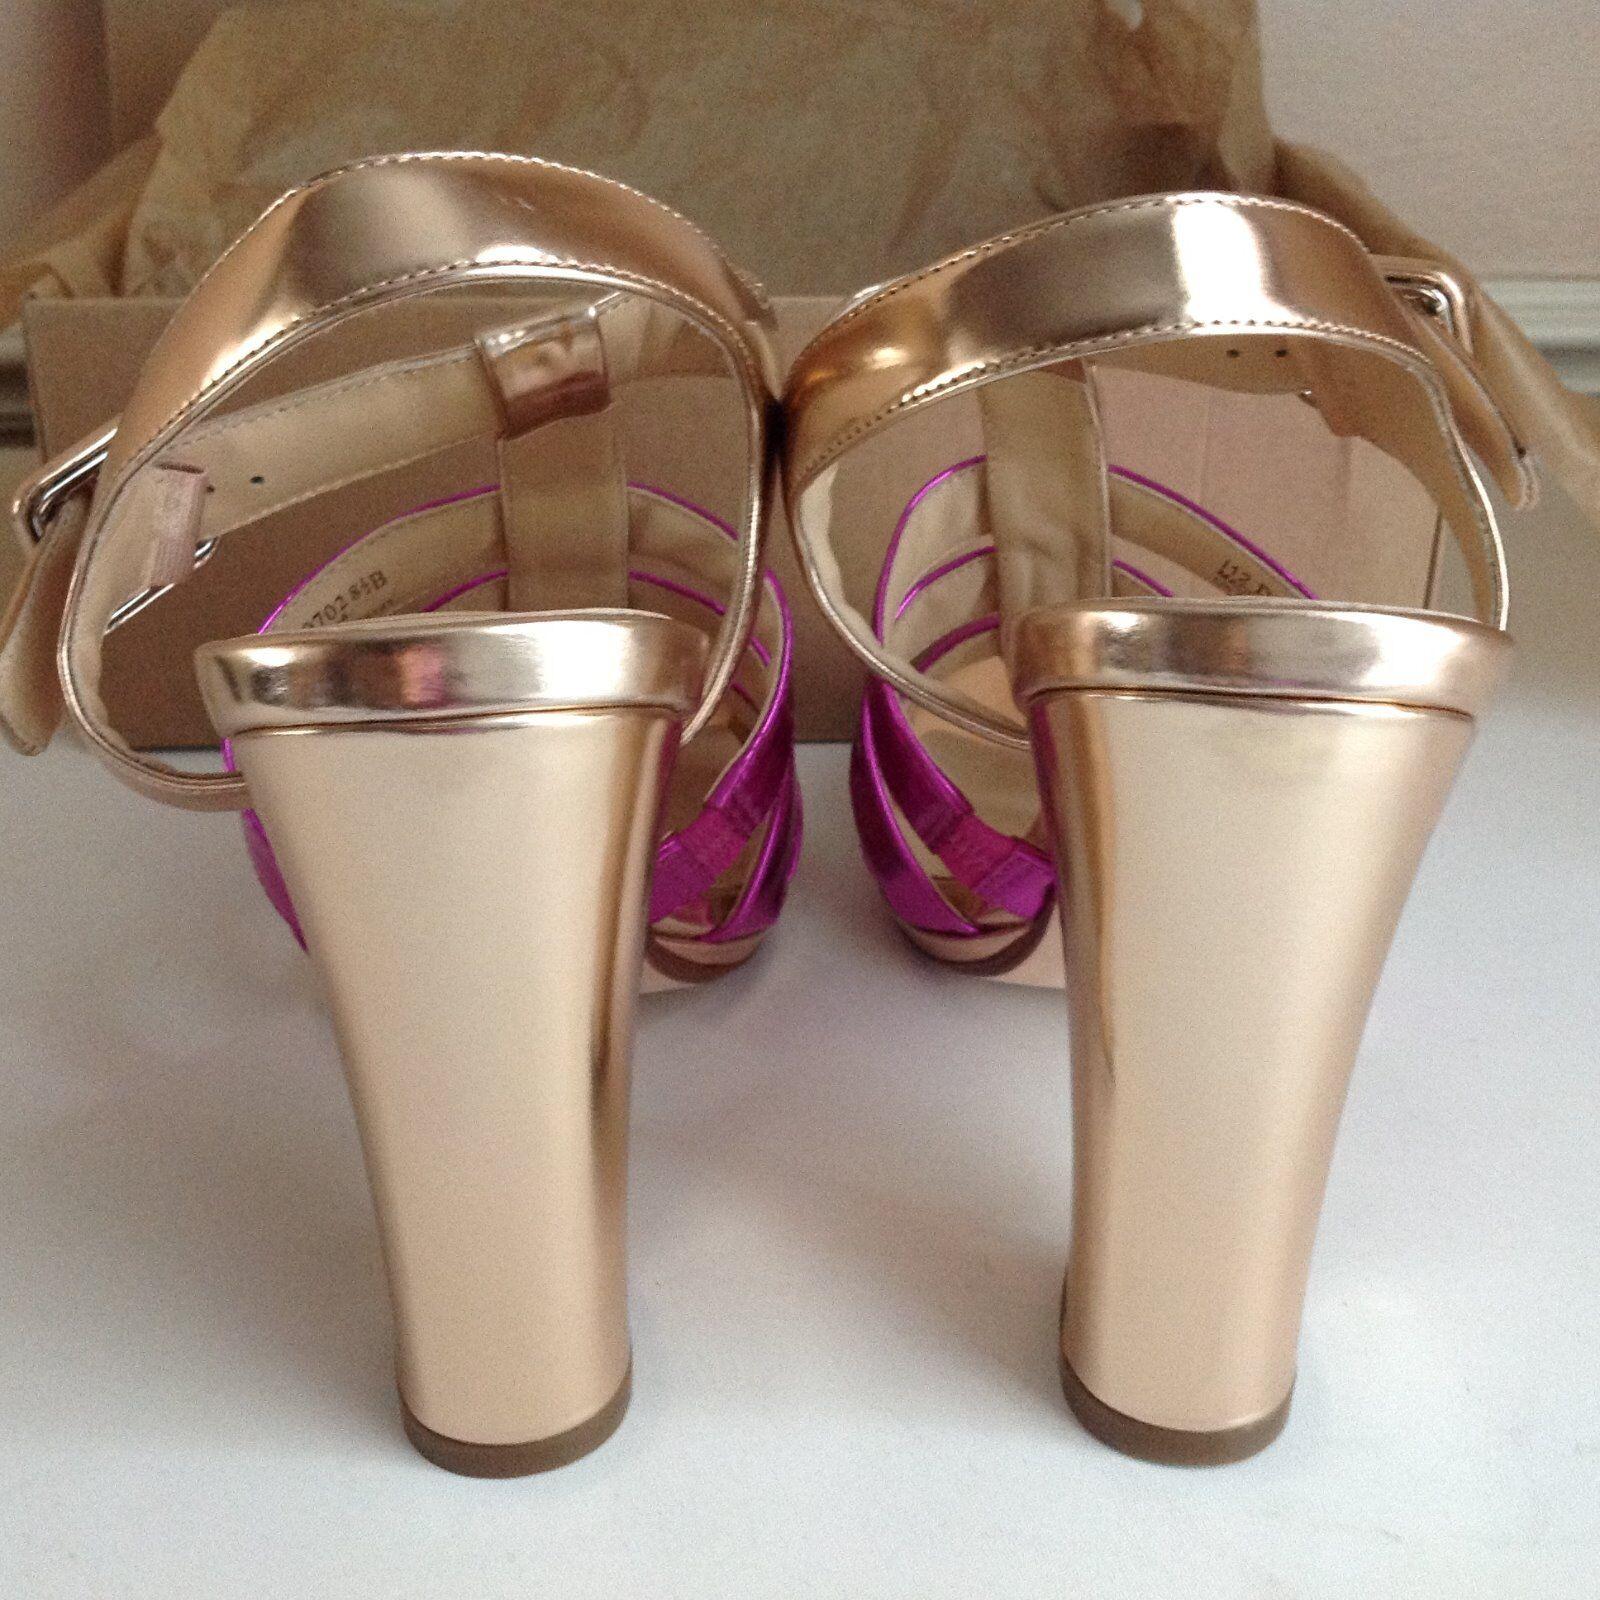 cole cole cole haan bronze fushiaRose  chelsea sangle us8.5 uk6 cuir sandale plate - forme 91eb82